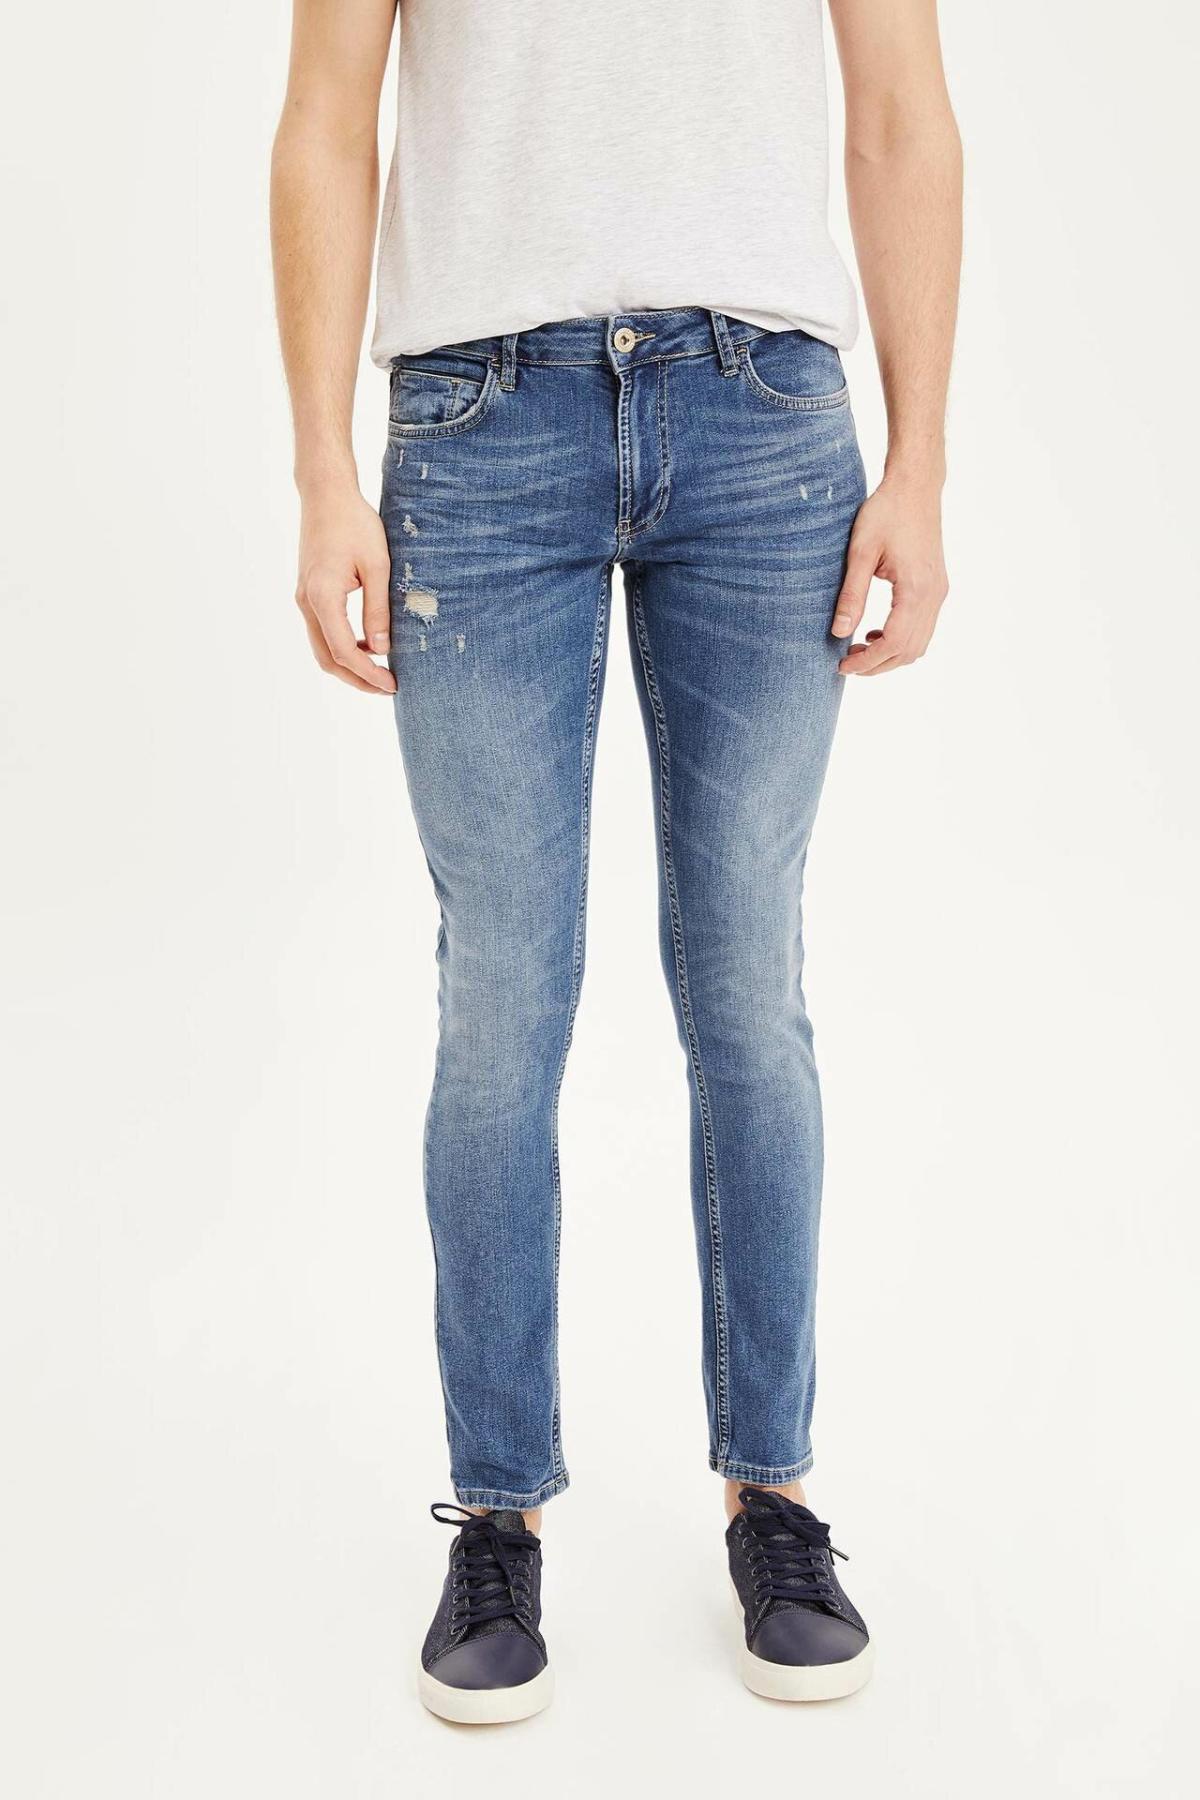 DeFacto Man Trousers-K0087AZ19SP